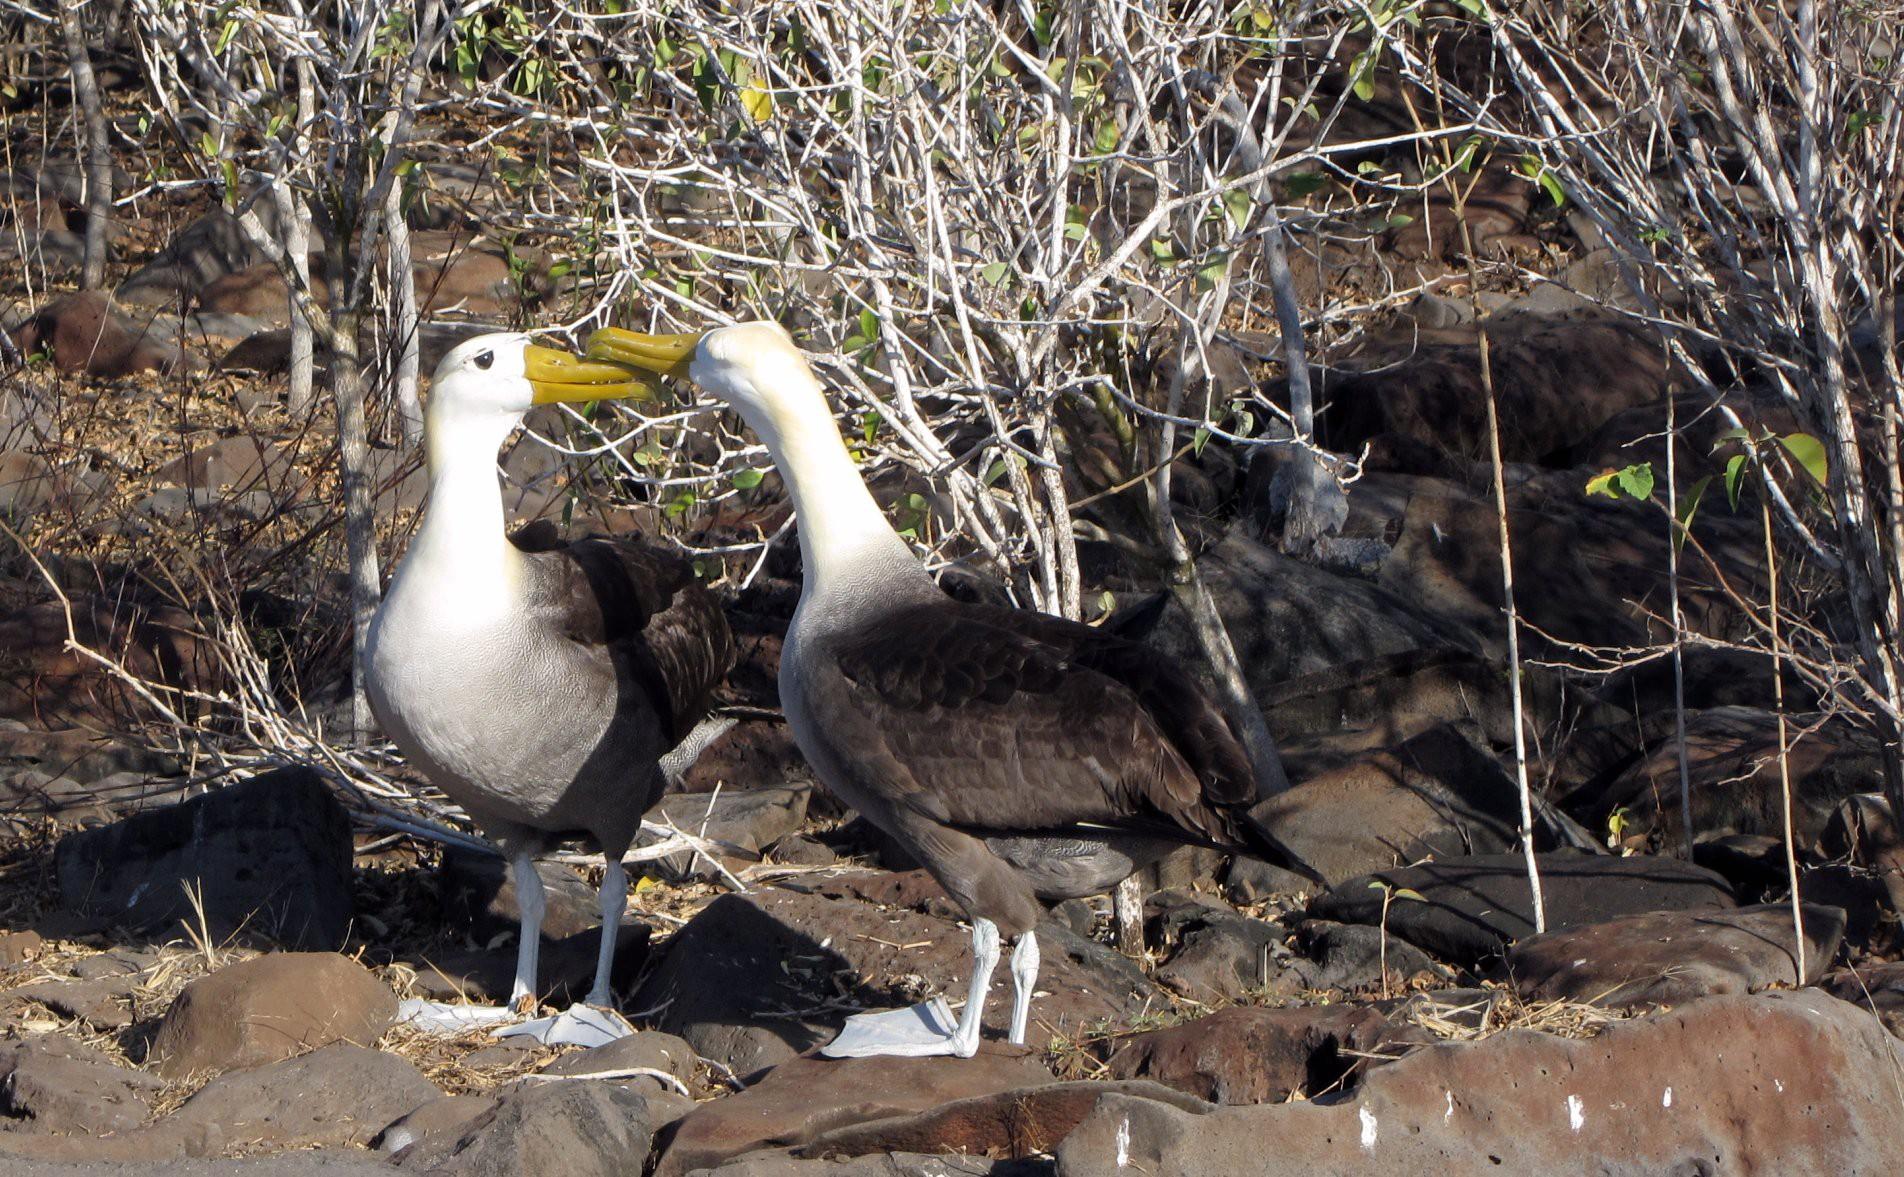 Galapagos Waved Albatross © Claumoho/Flickr.com